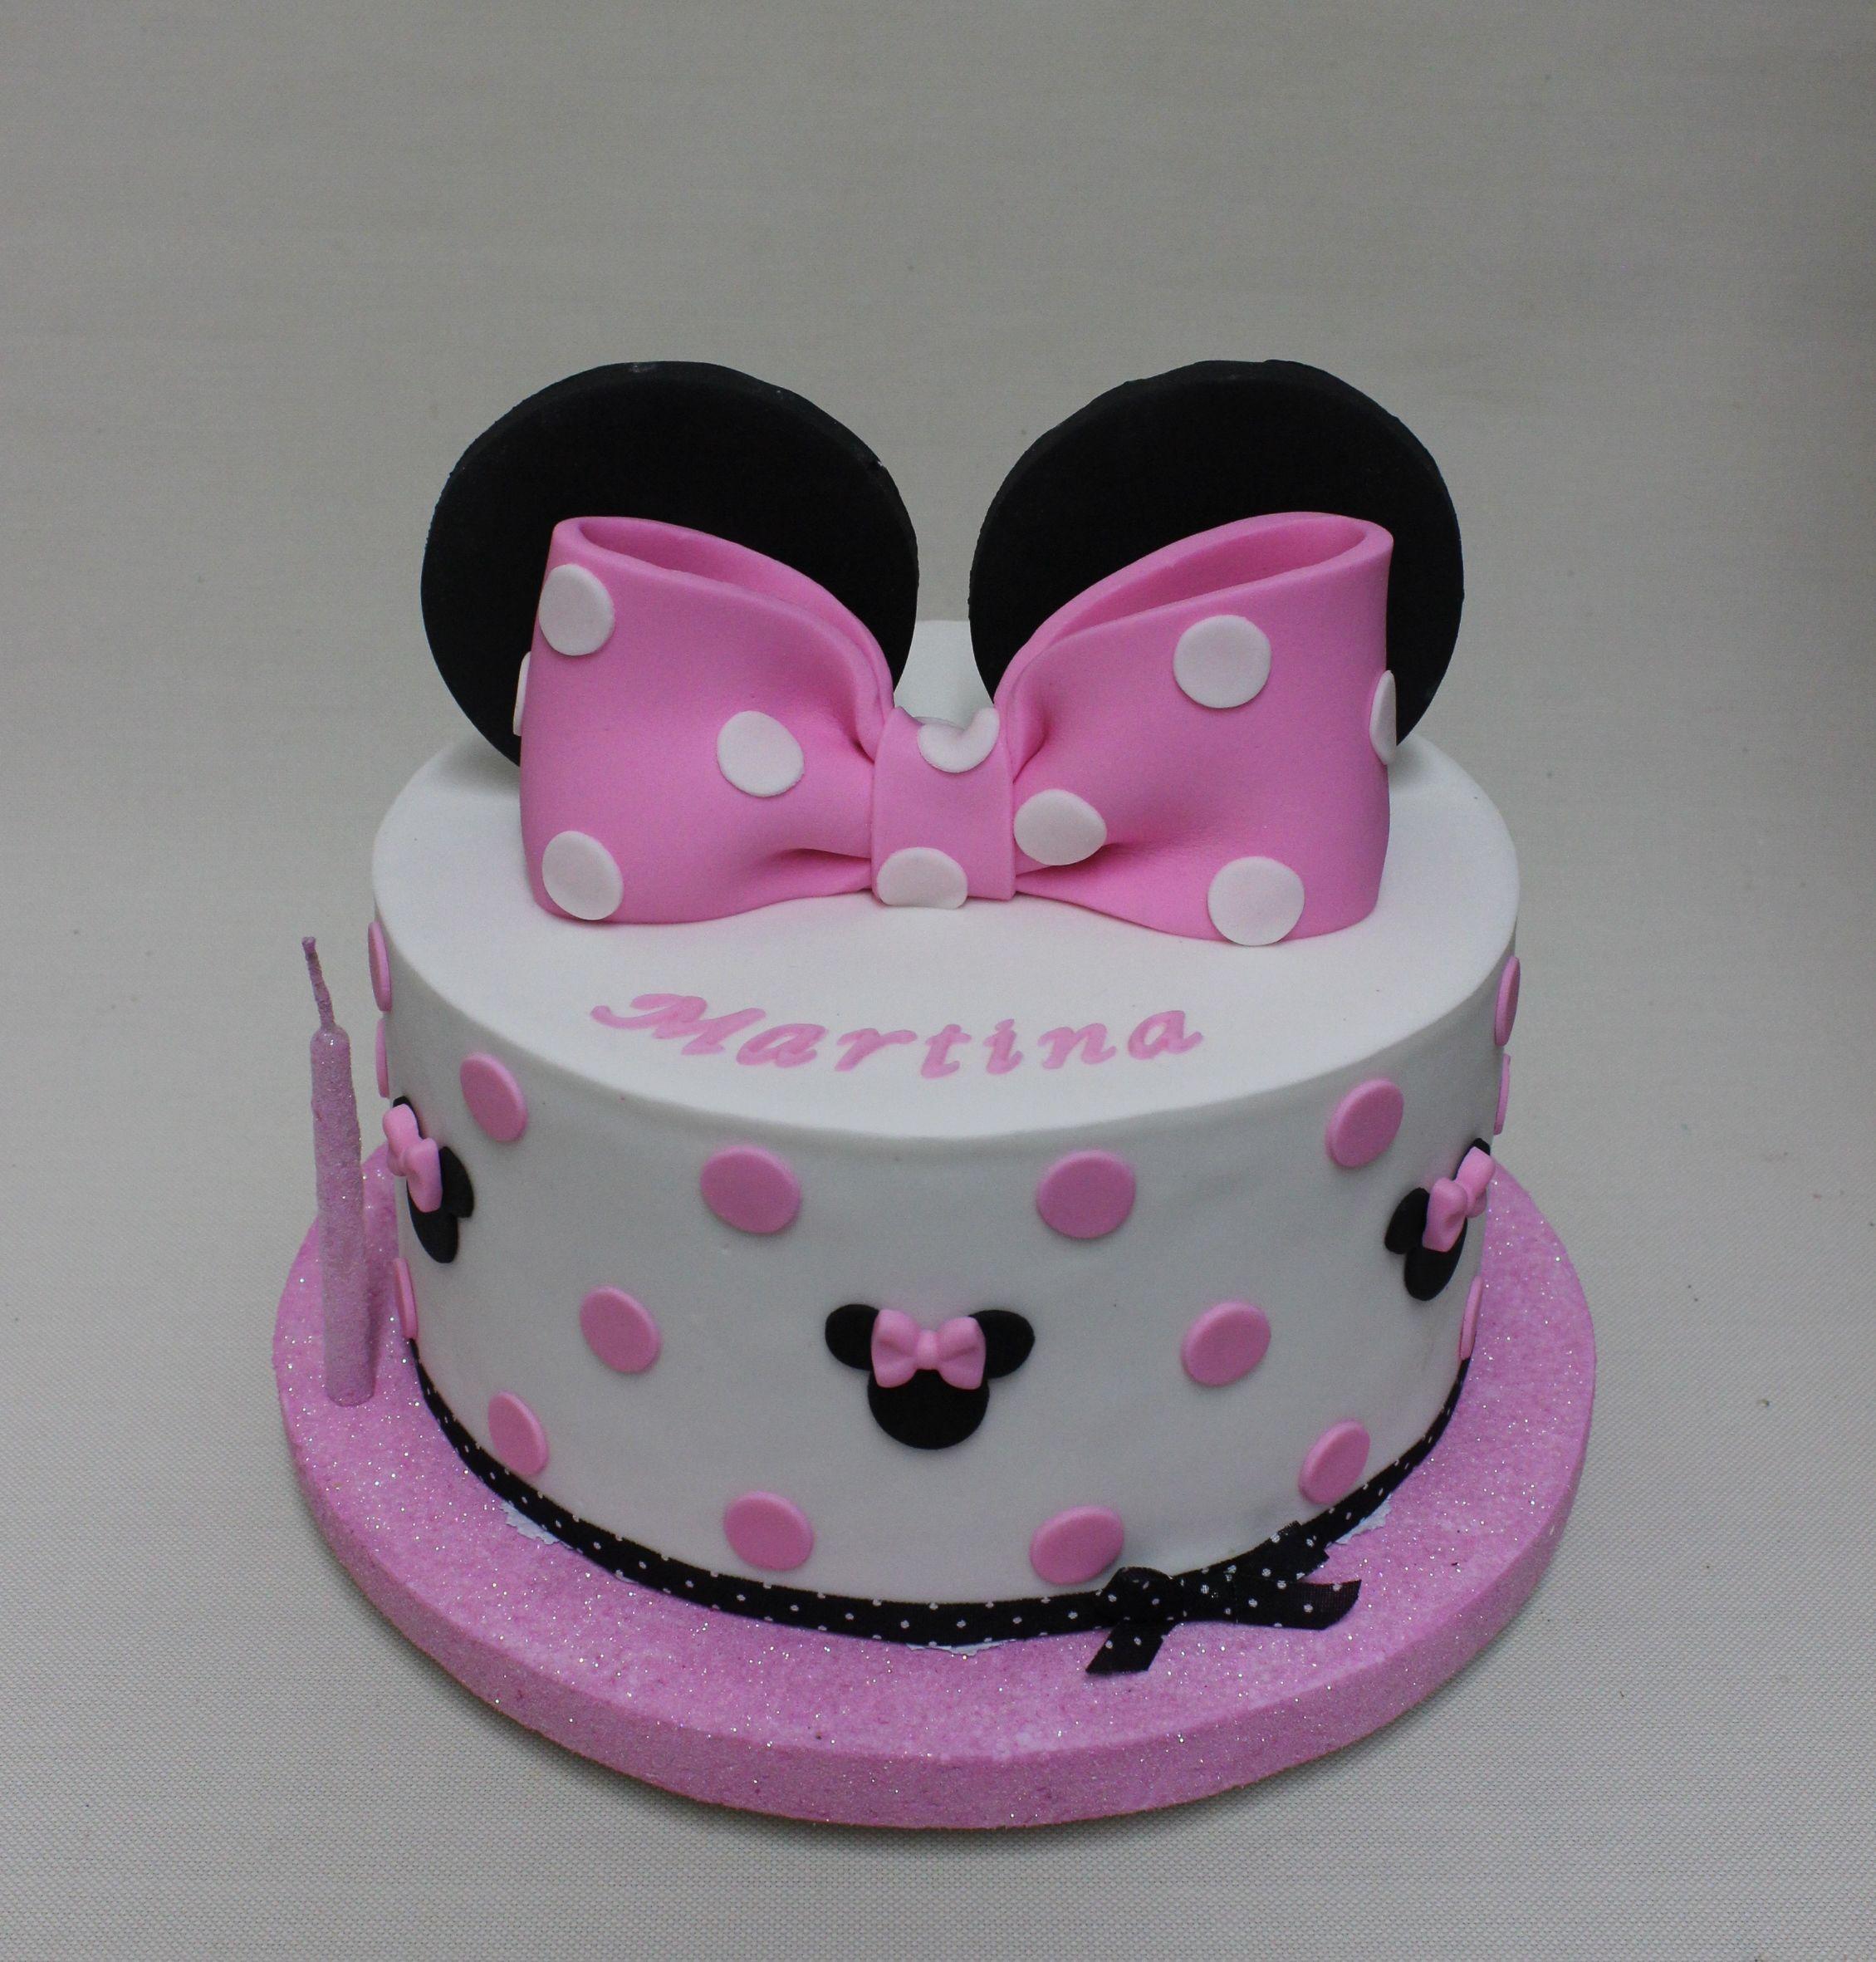 Minnie Mouse Cake Violeta Glace | Minnie cake, Minnie mouse birthday cakes,  Minnie mouse cake